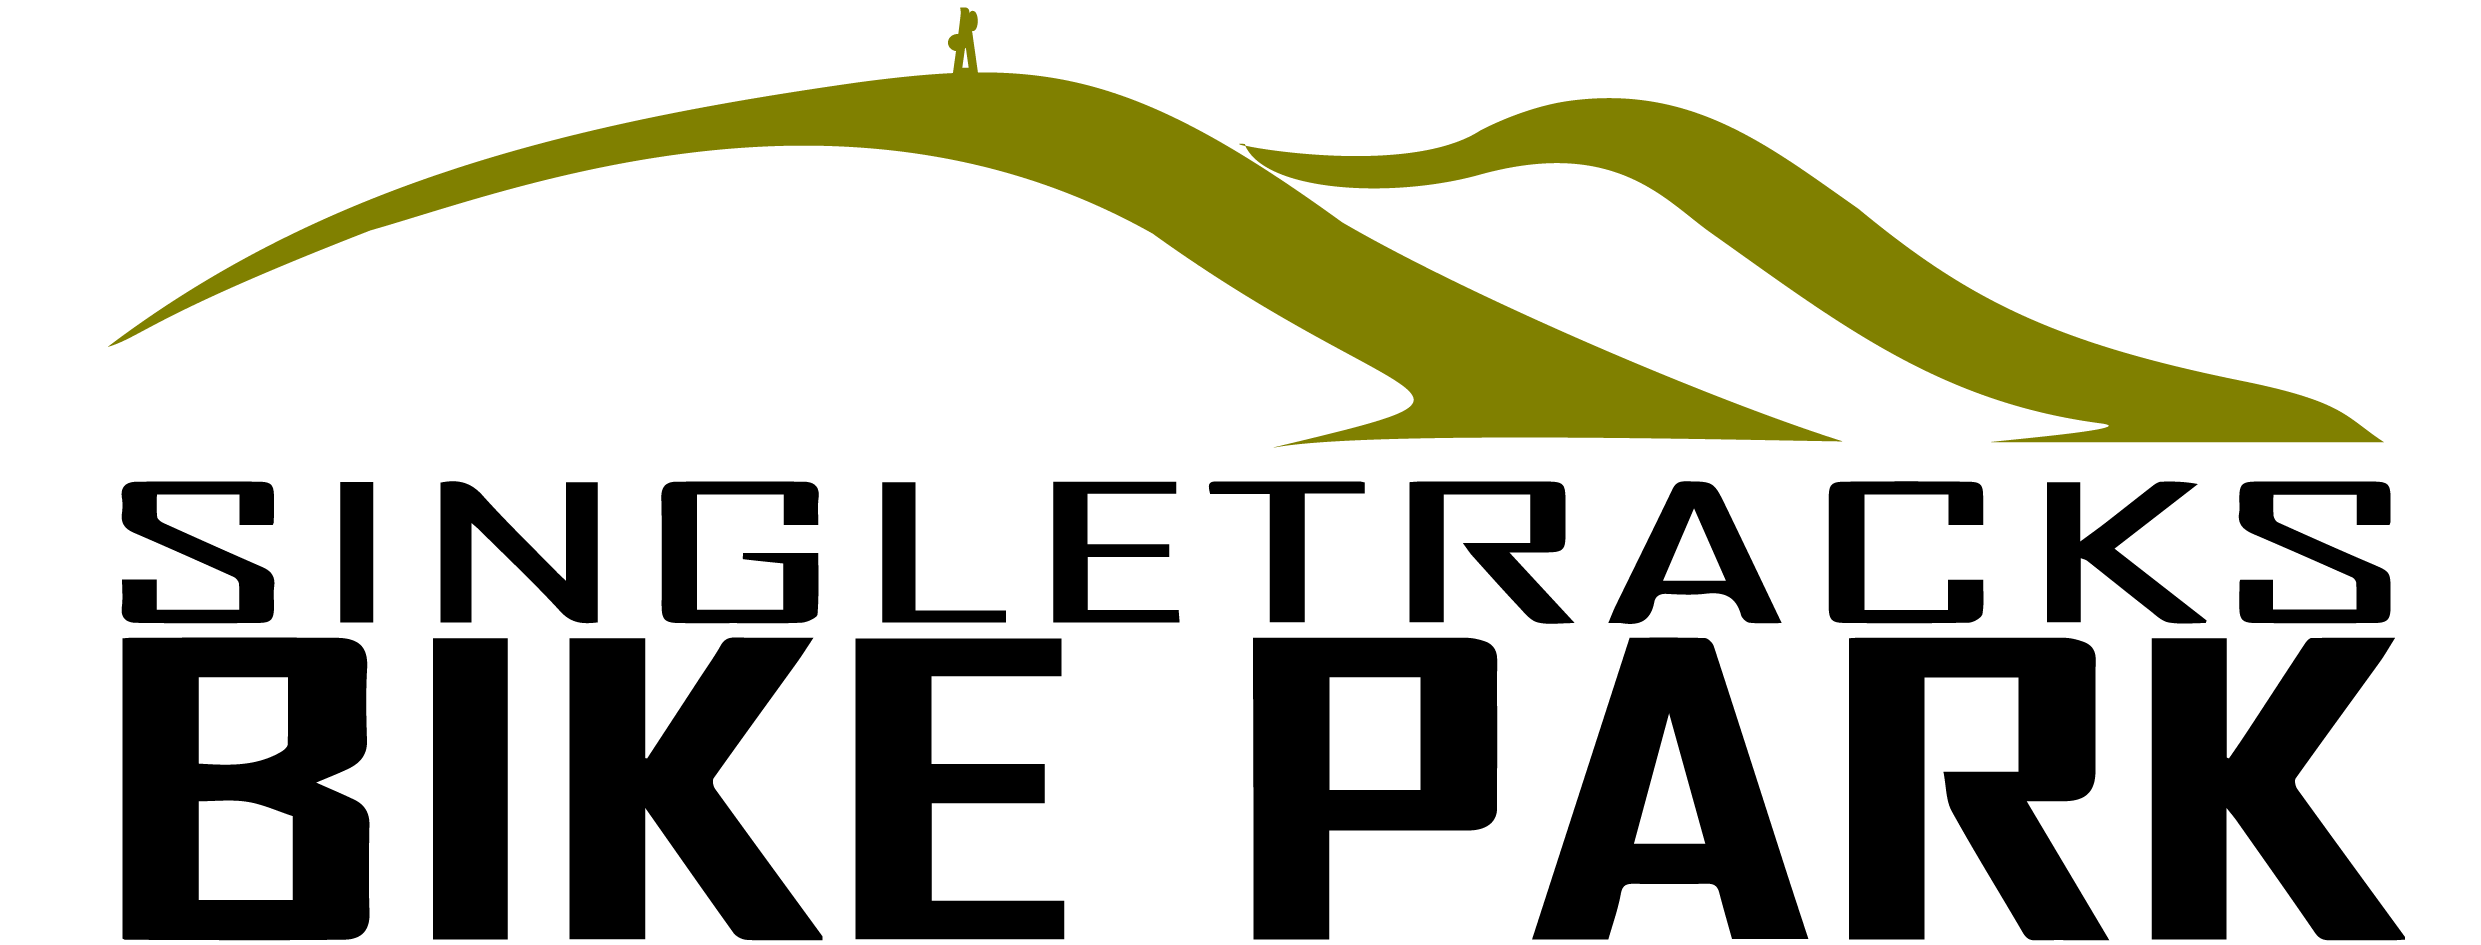 Singletracks Bikepark Blanc V2-01-01